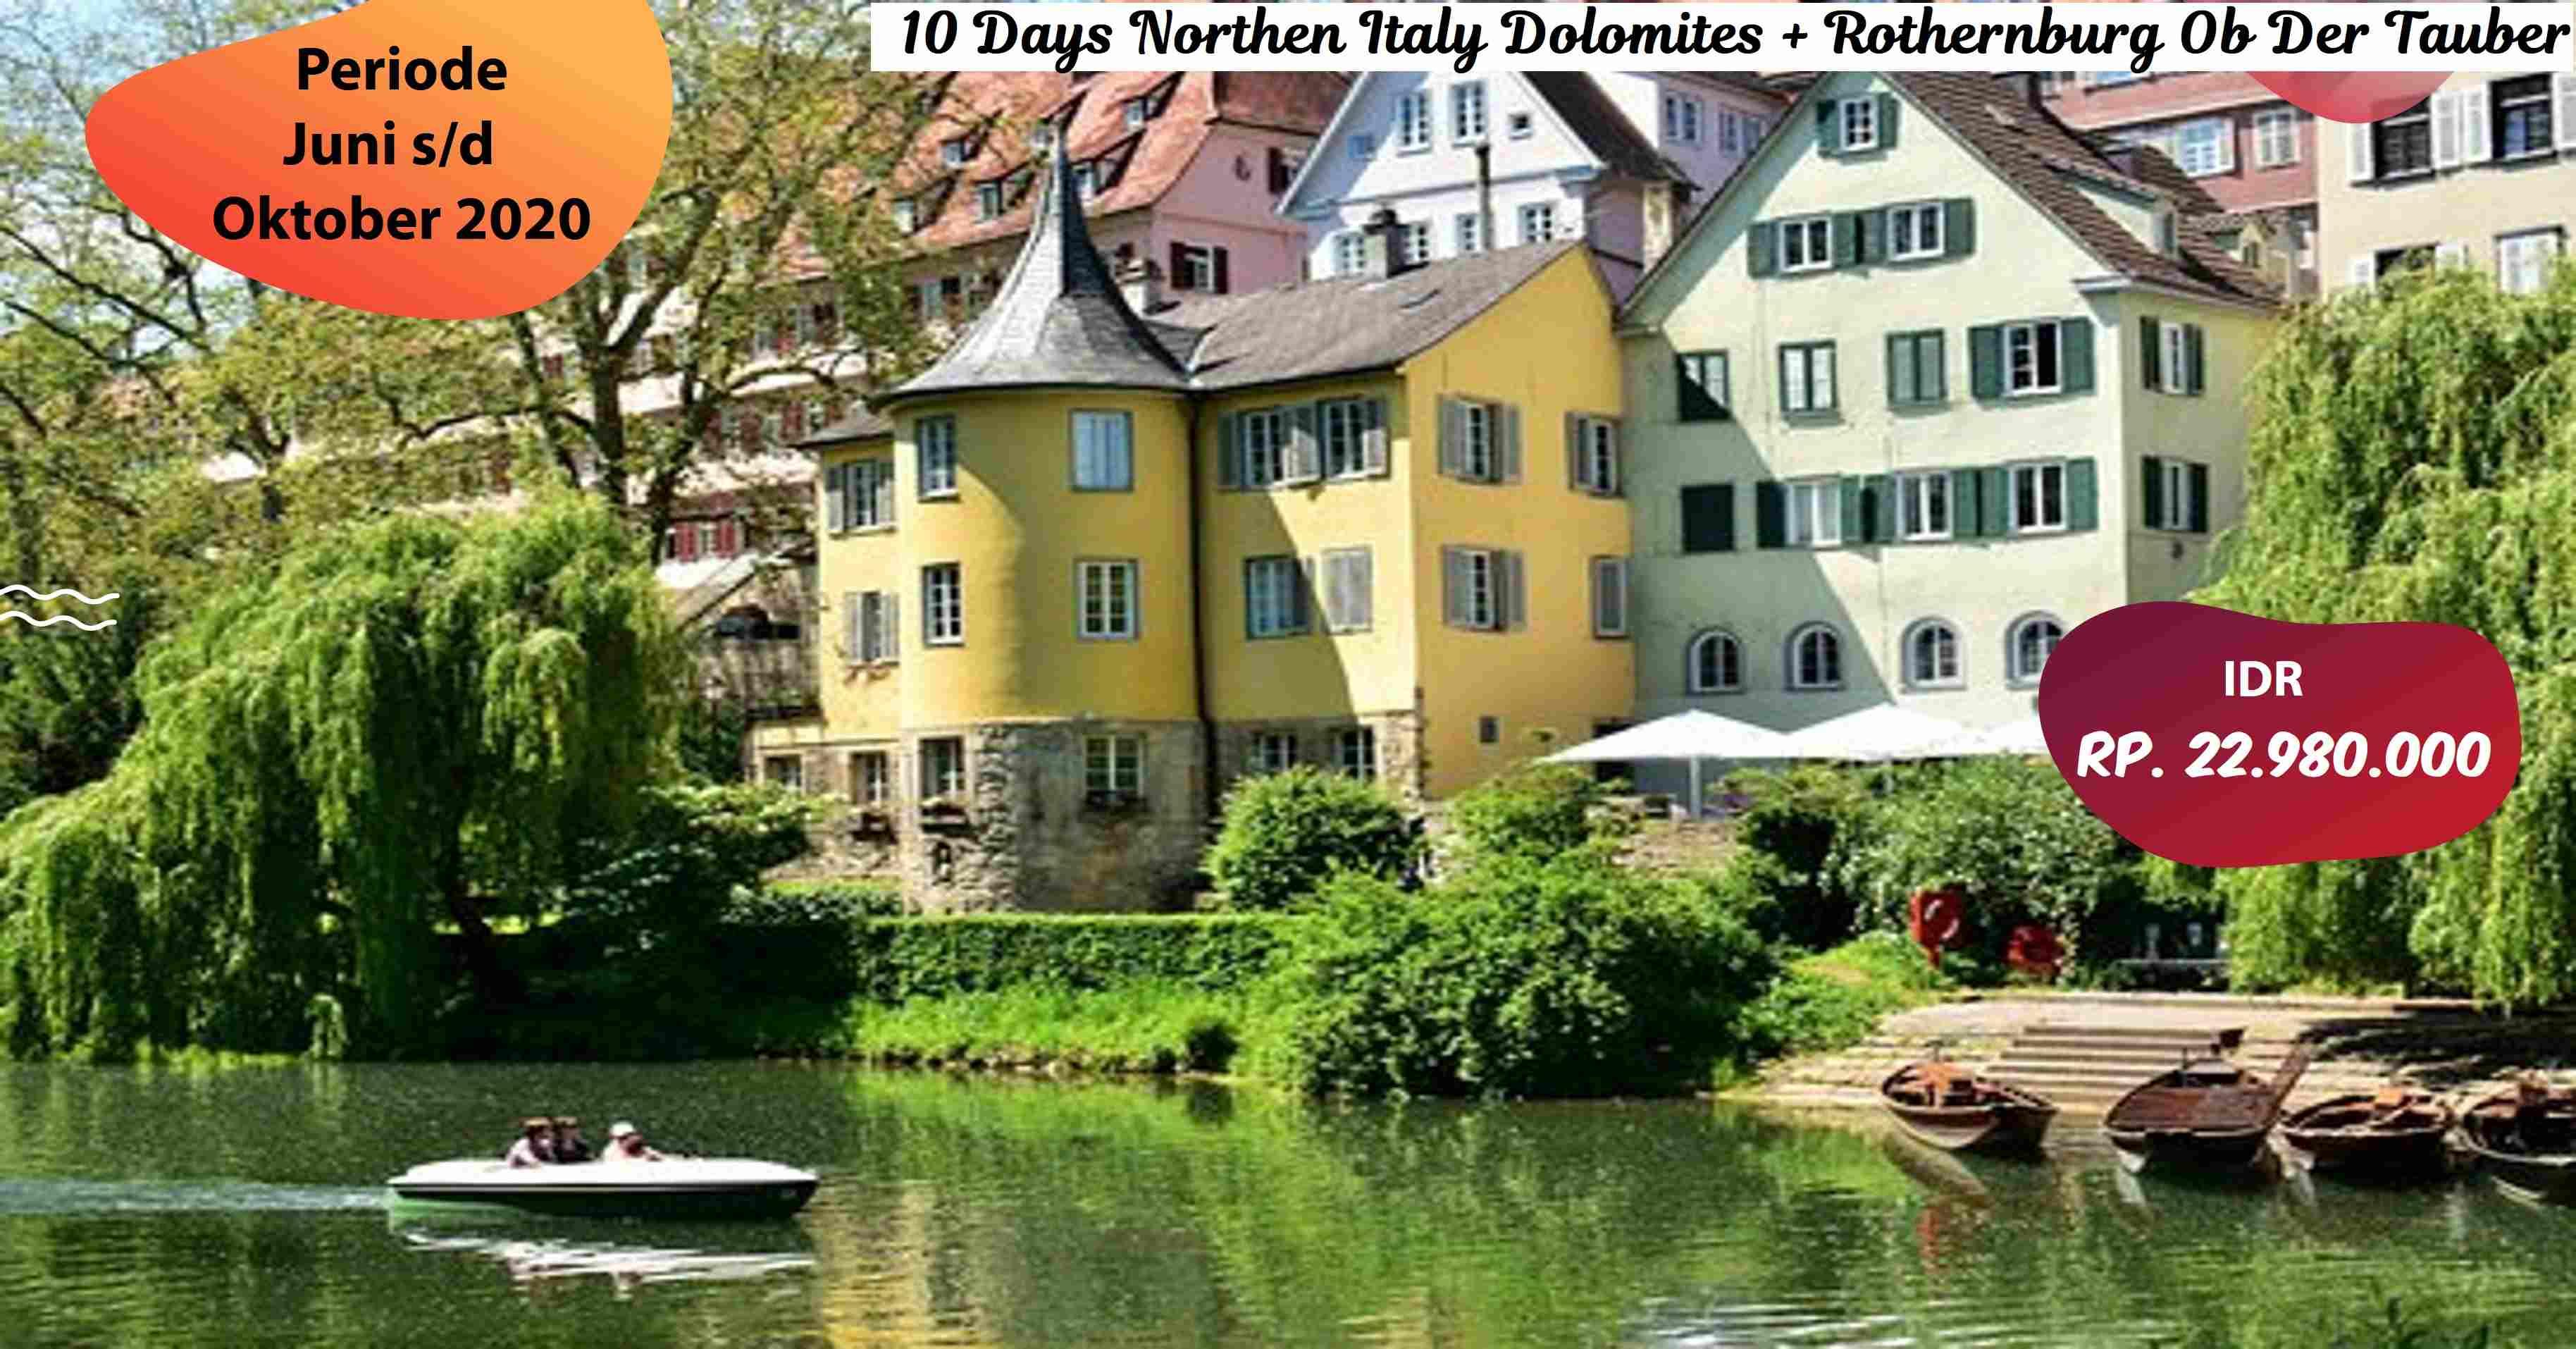 jual 10 Days Northen Italy Dolomites Rothernburg Ob Der Tauber